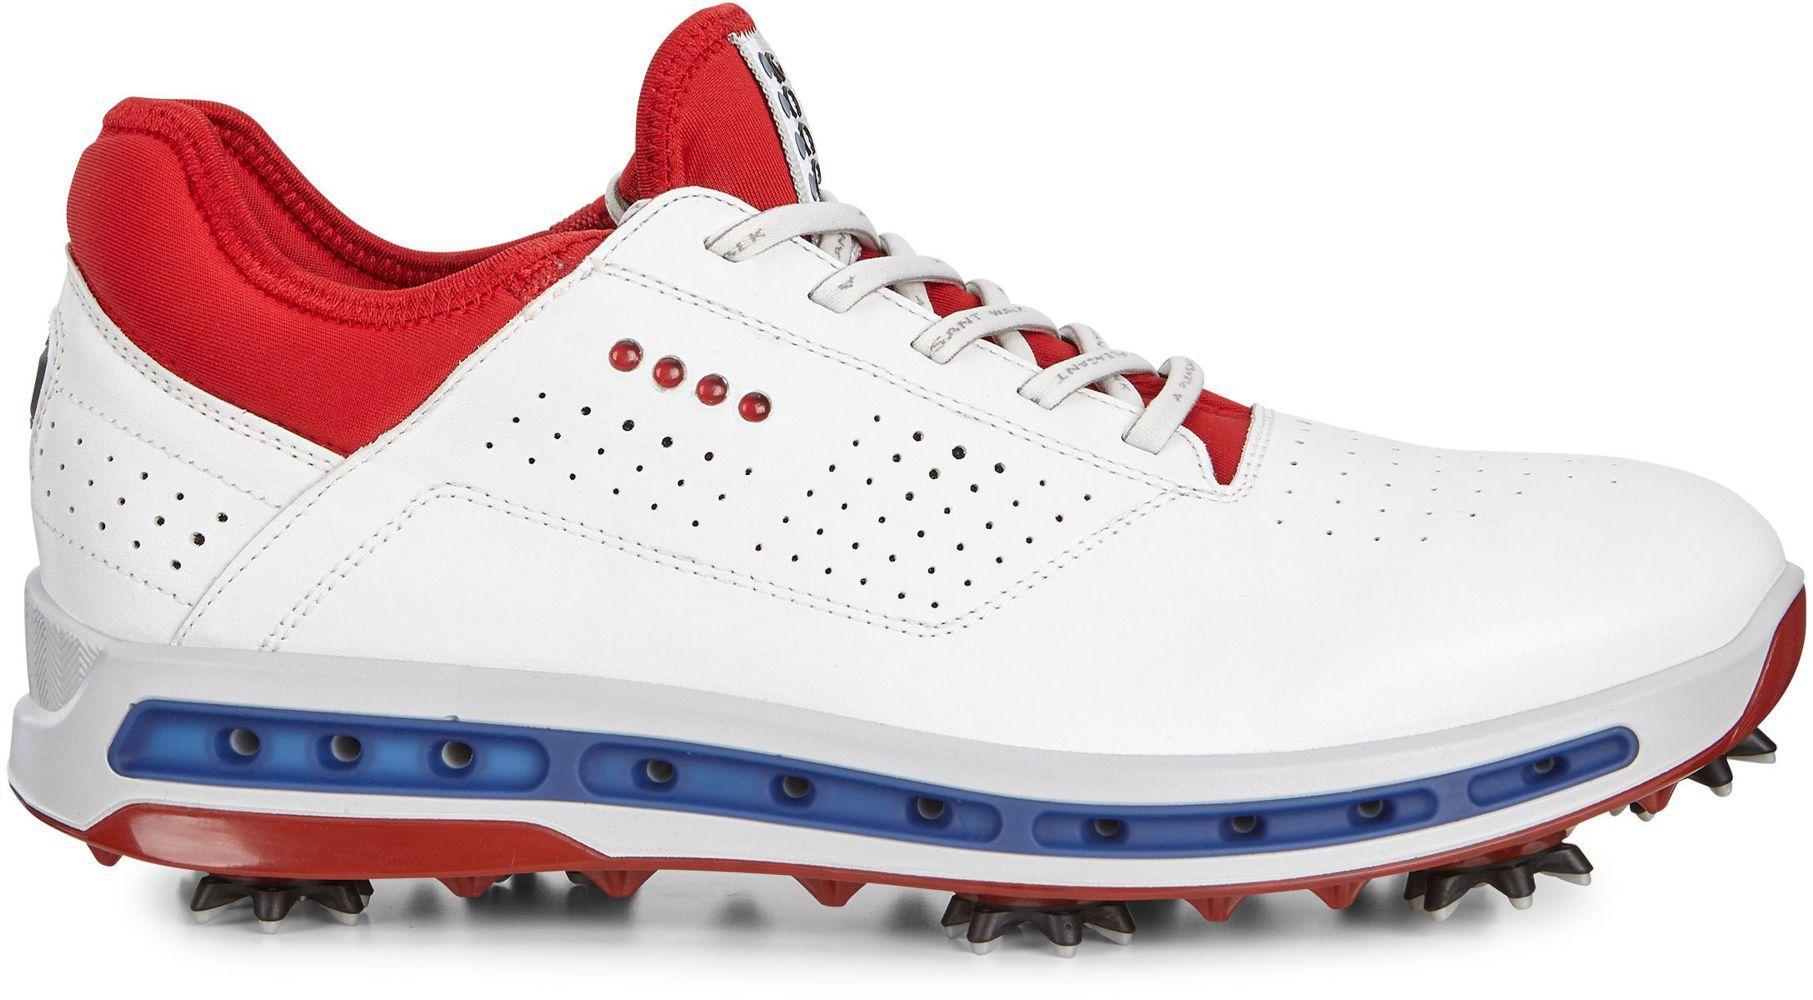 Ecco Golf Cool Gore-Tex pánské golfové boty, bílo/červené bílá, standardní, 7,5